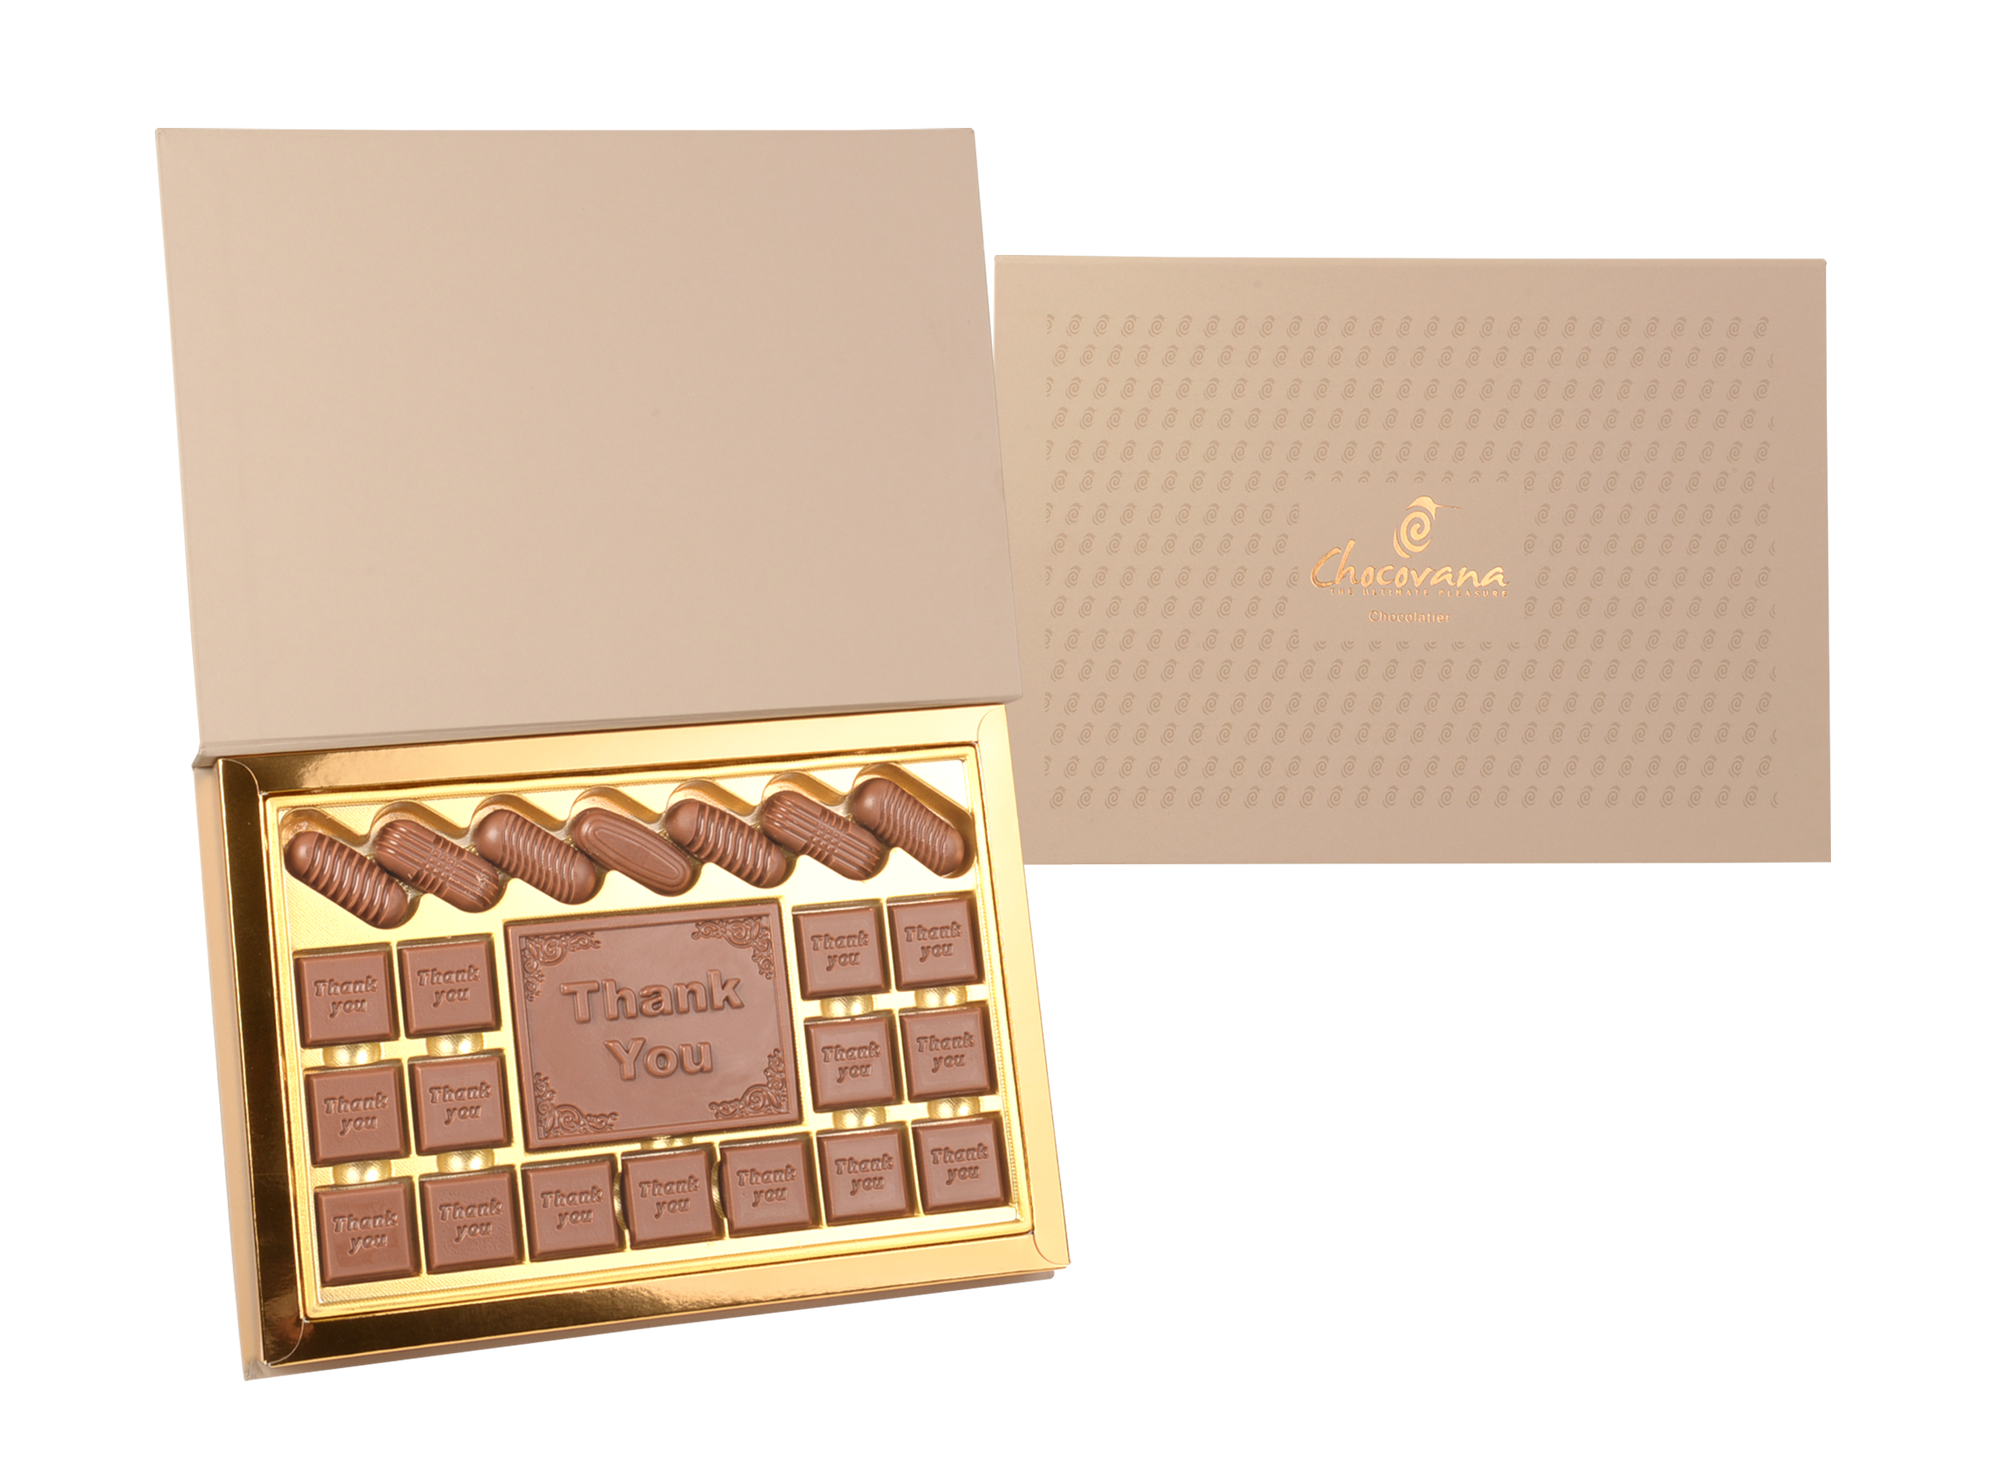 Bella Thank You, 22 Pcs + 1 Bar In Customized Belgian Chocolate